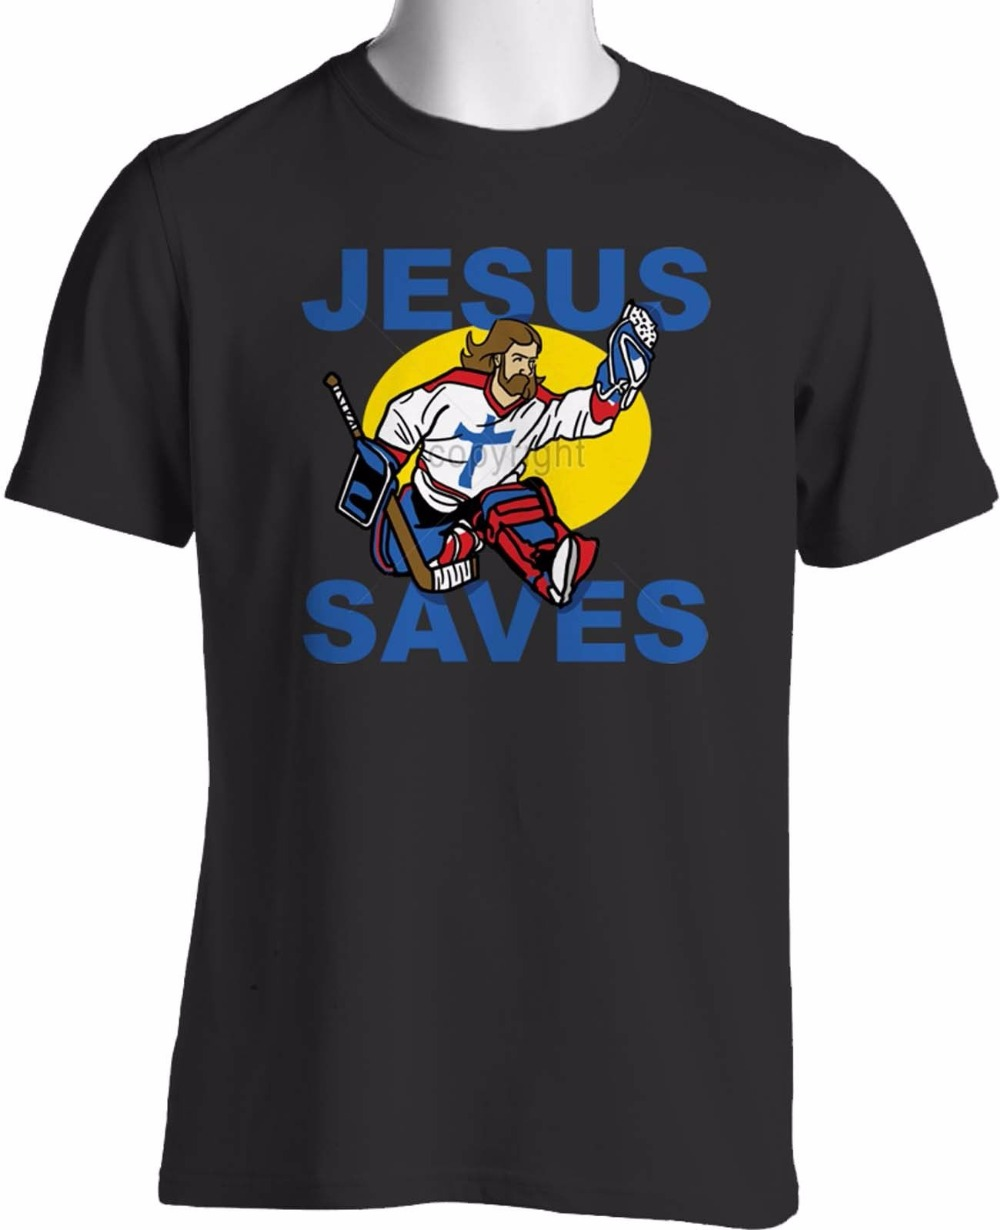 Joke T Shirts Crew Neck Short Jesus Saves T Shirt Praise God Player Funny Religious S To 3XL Office Mens Tee